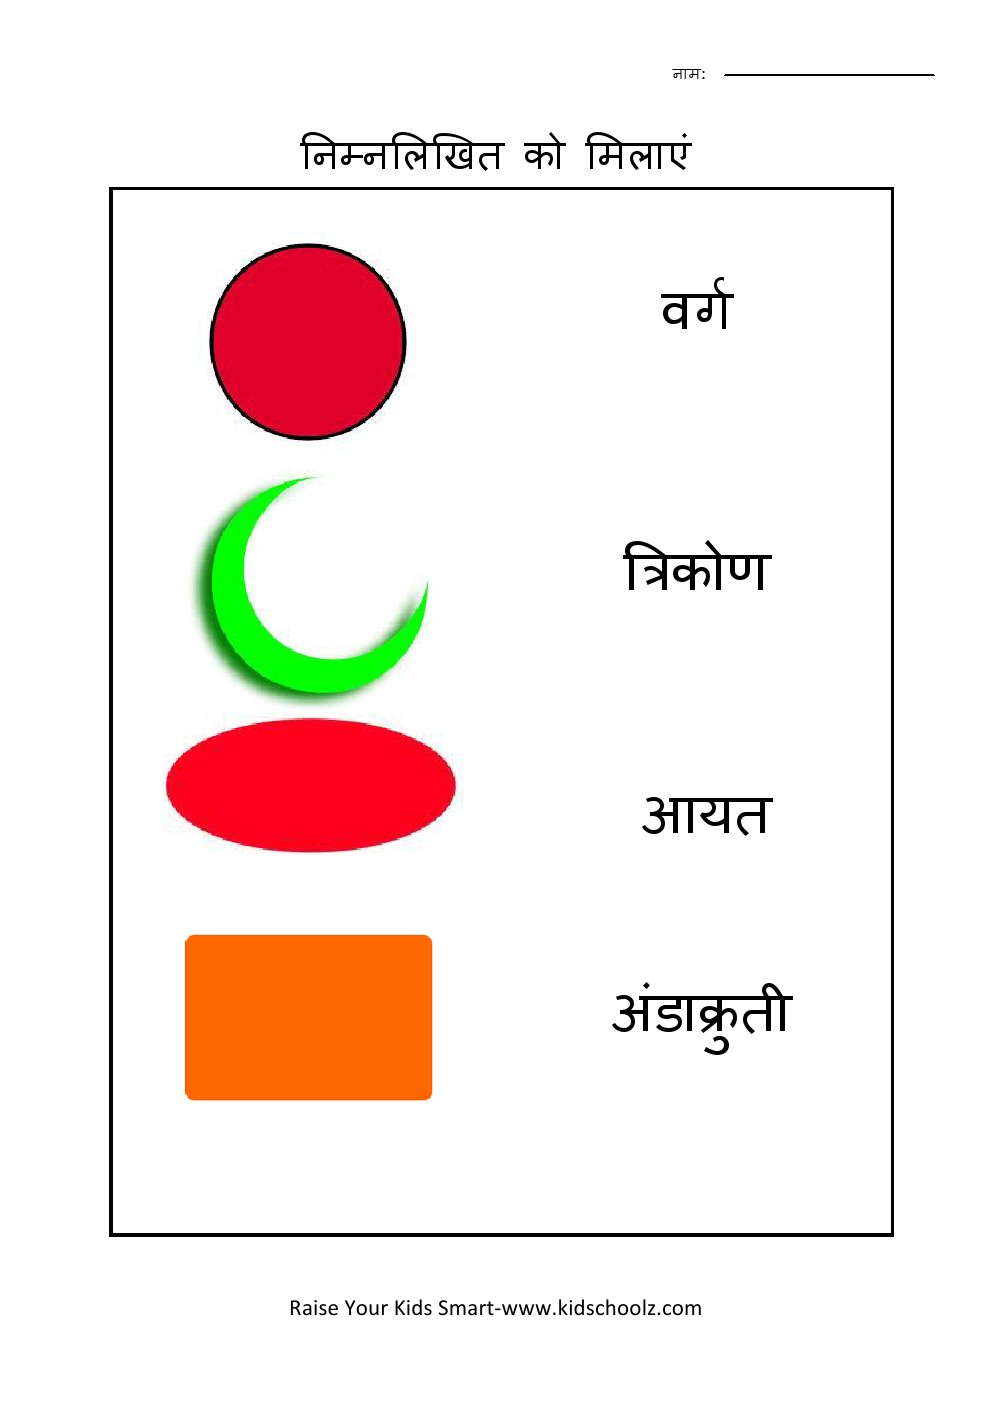 Hindi- Matching Shapes Worksheet - Kidschoolz